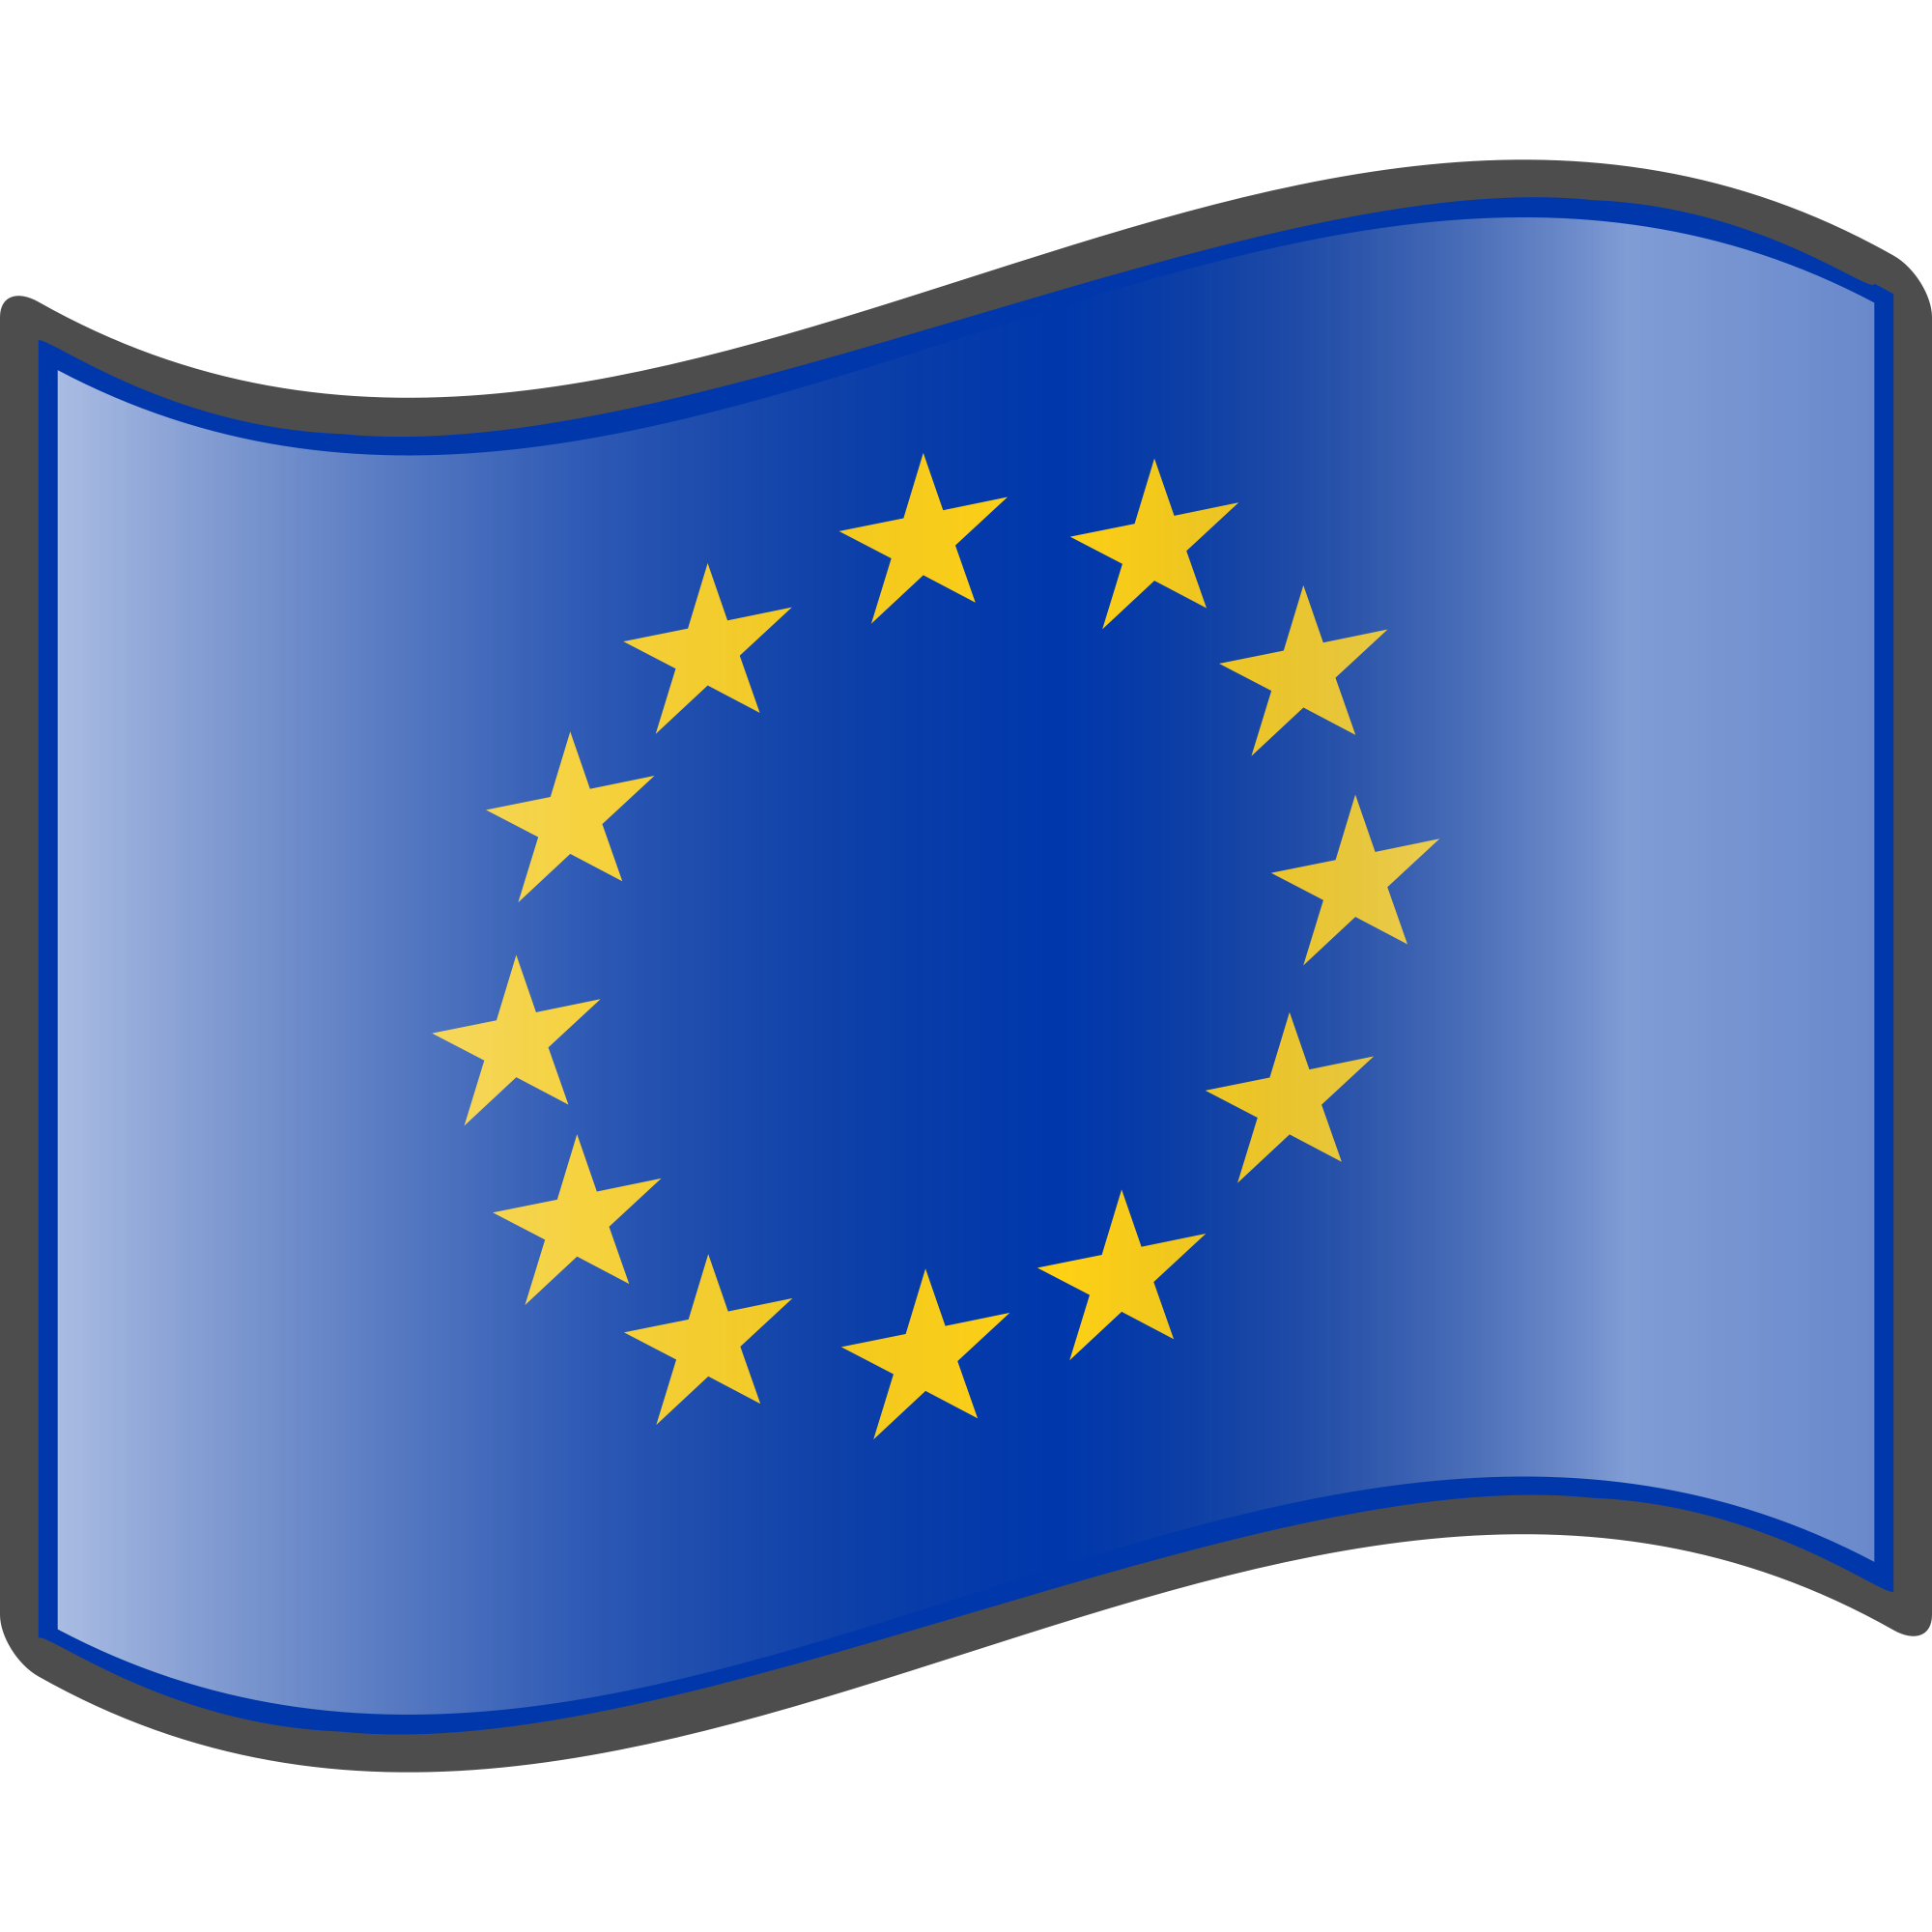 Europe clipart flag europe. File nuvola svg wikimedia